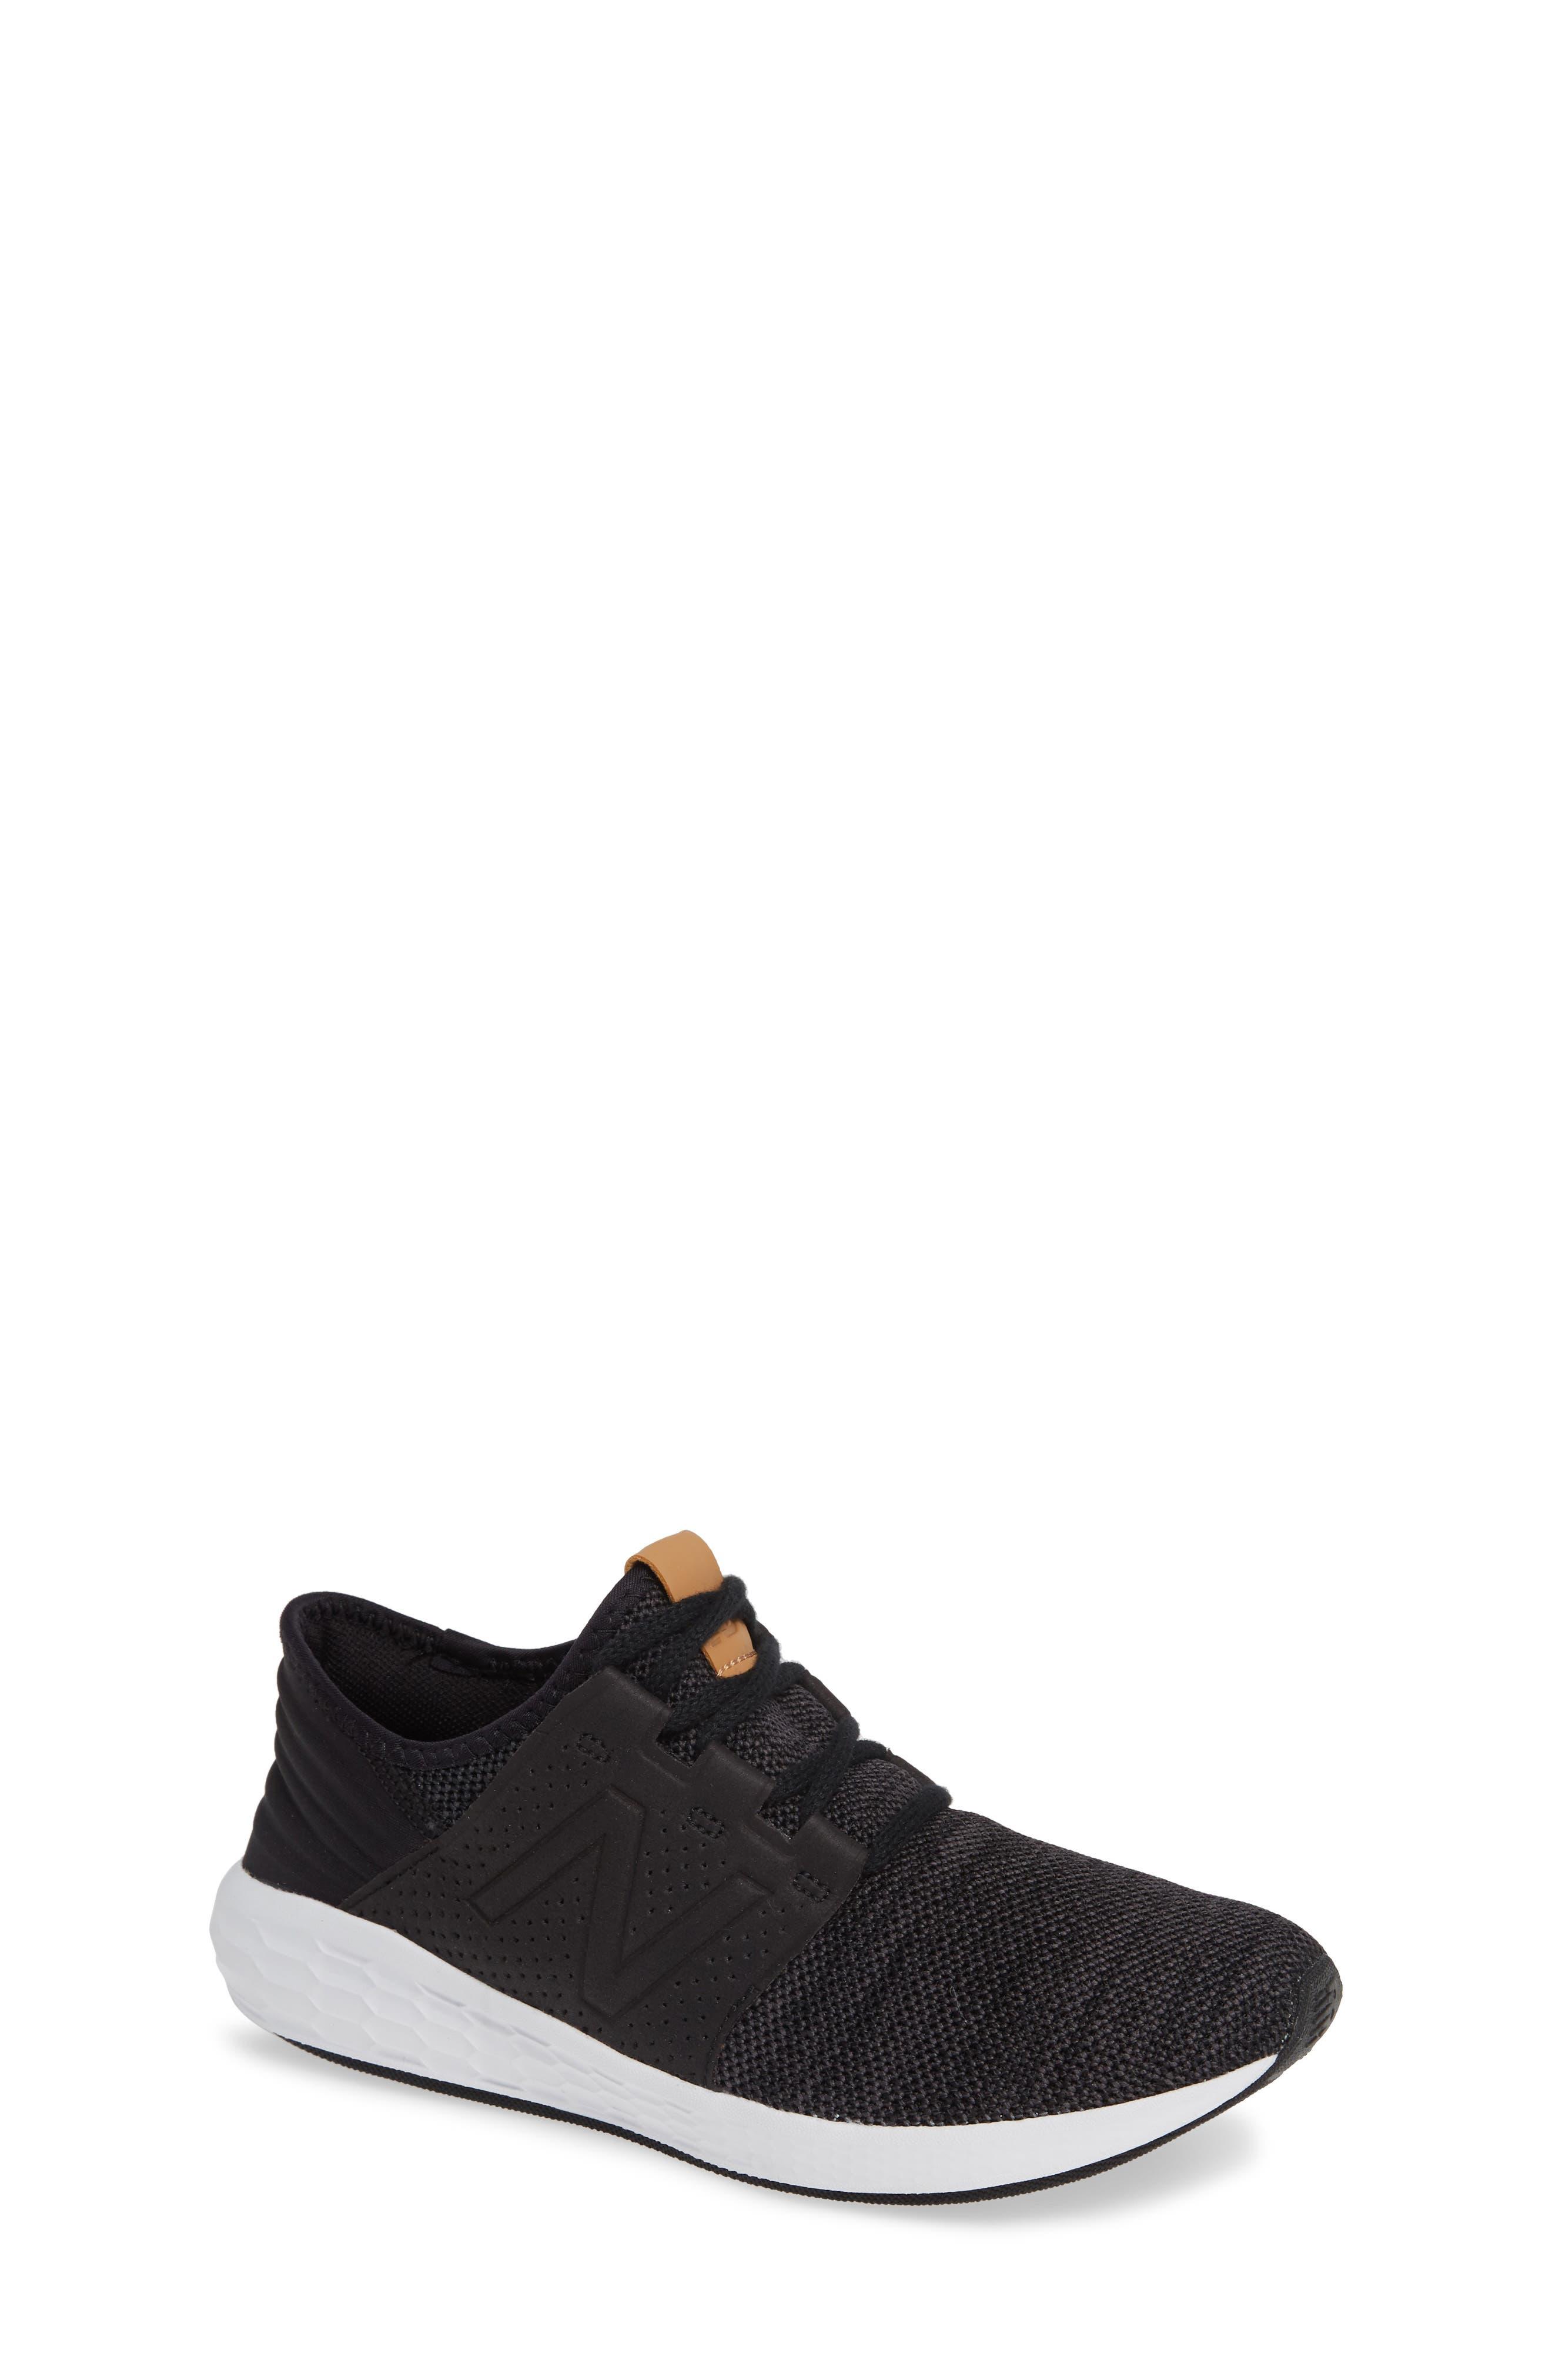 Cruz V2 Sport Sneaker,                         Main,                         color, BLACK/ MAGNET